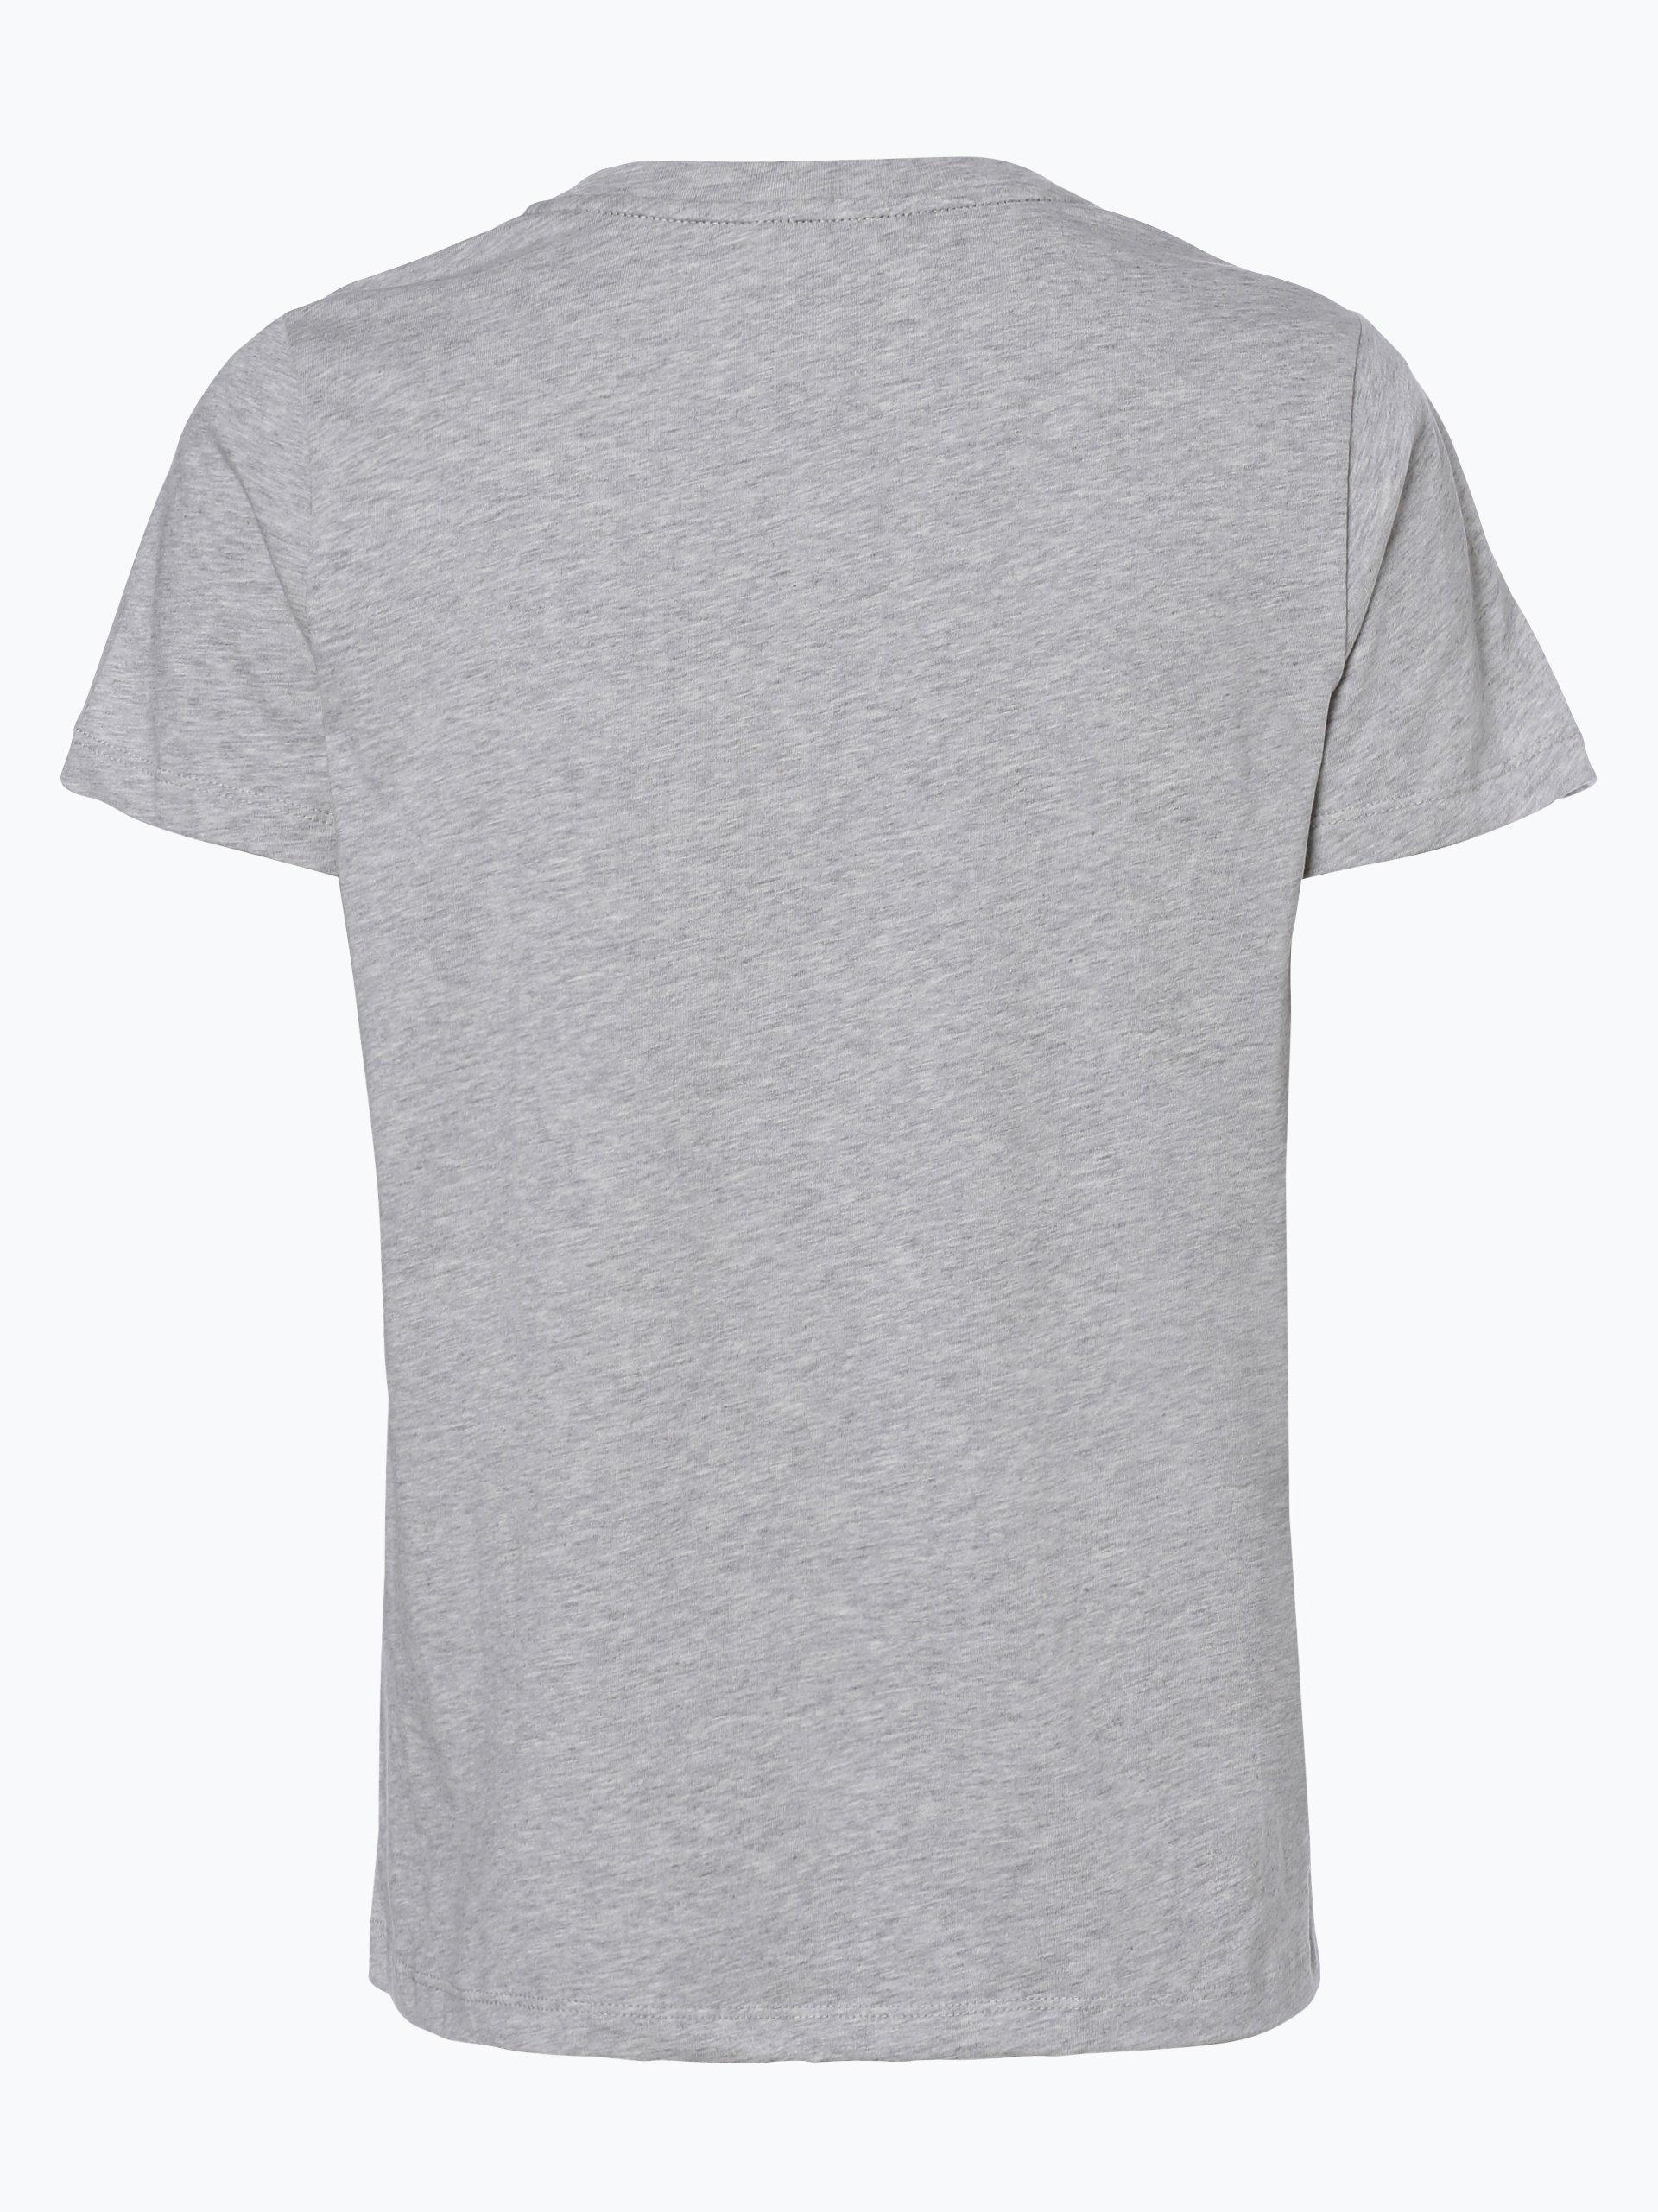 tommy hilfiger damen t shirt grau uni online kaufen. Black Bedroom Furniture Sets. Home Design Ideas